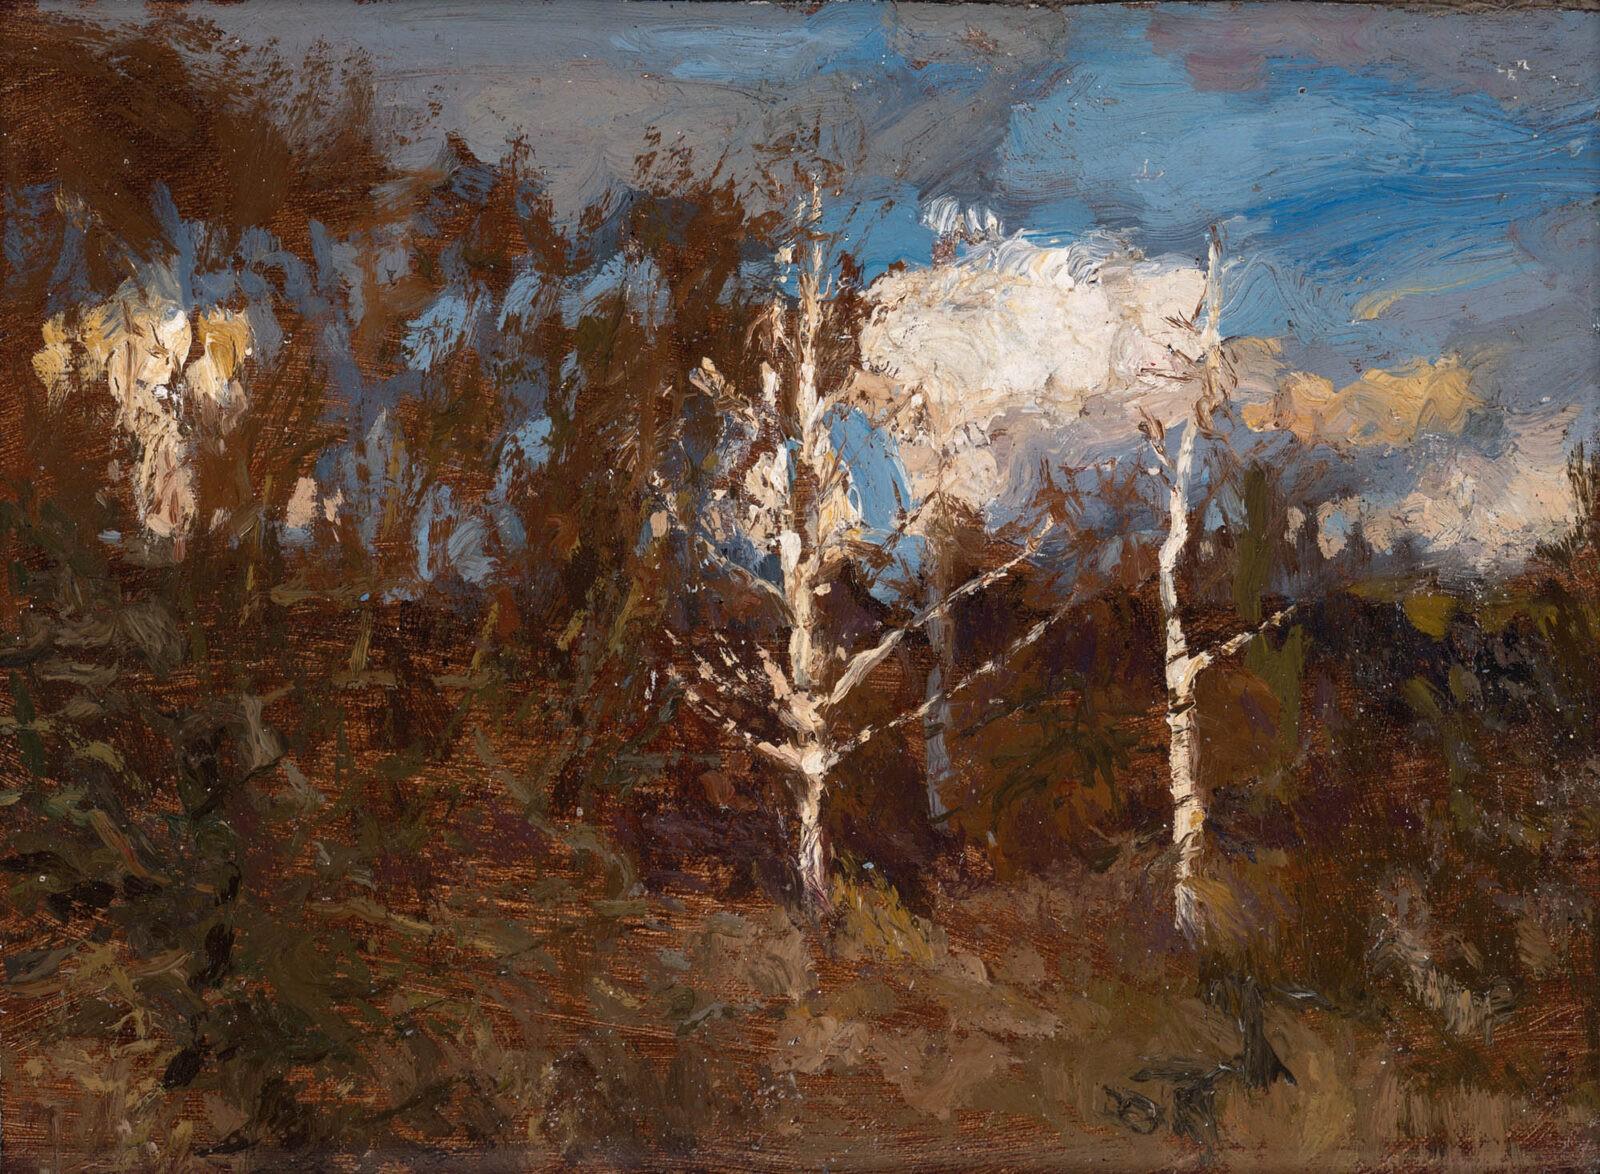 Liza Visagie - Winter Birch Trees. Oil on Linen 5 x 9 inches